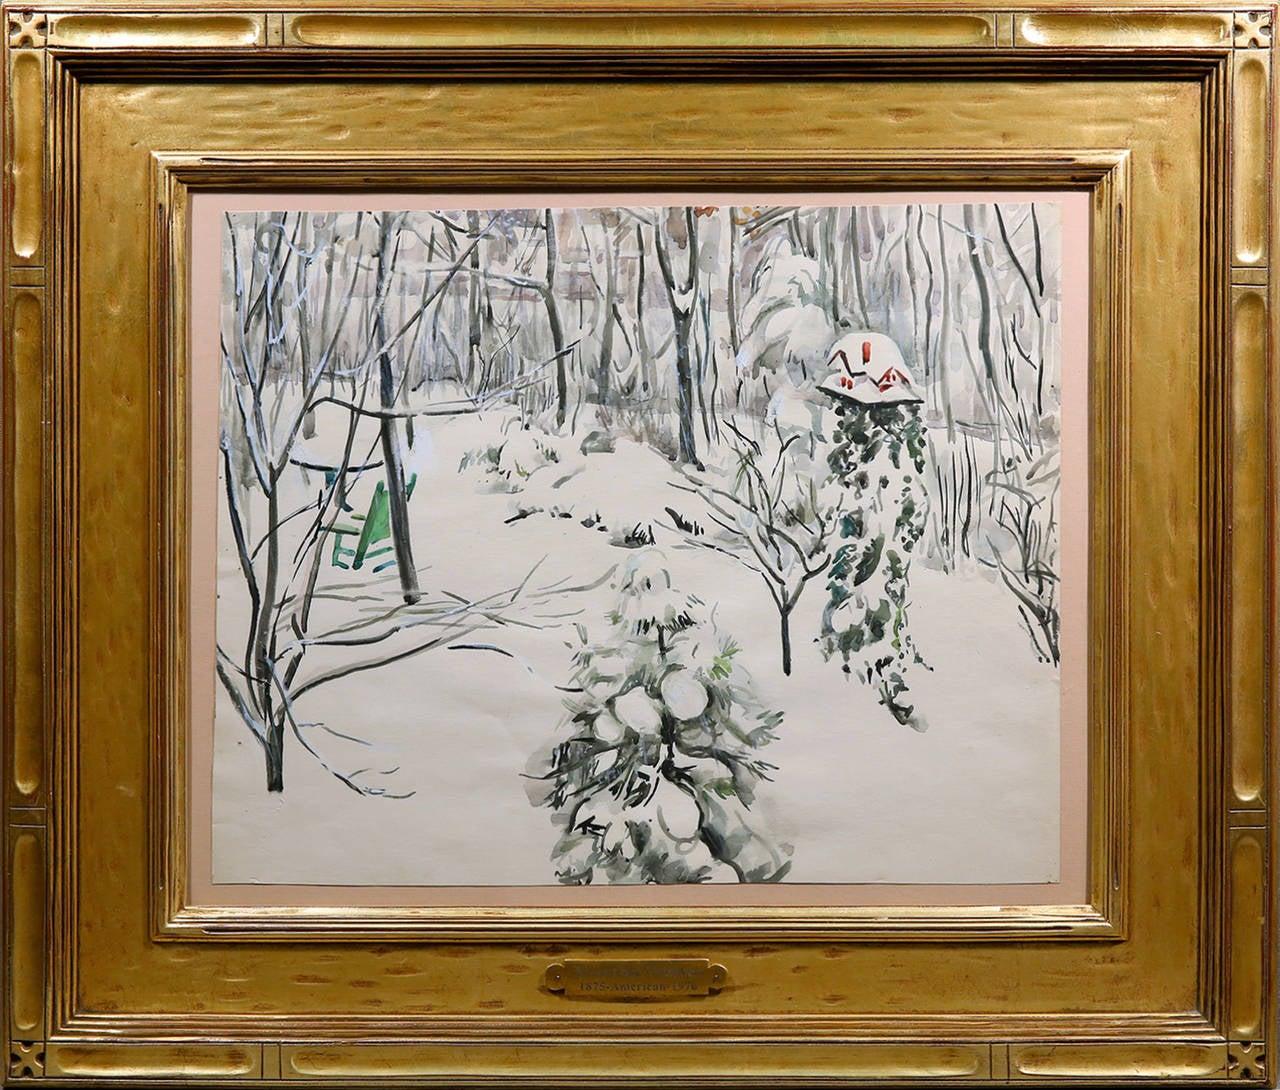 Martha Walter Landscape Art - Snow Scene